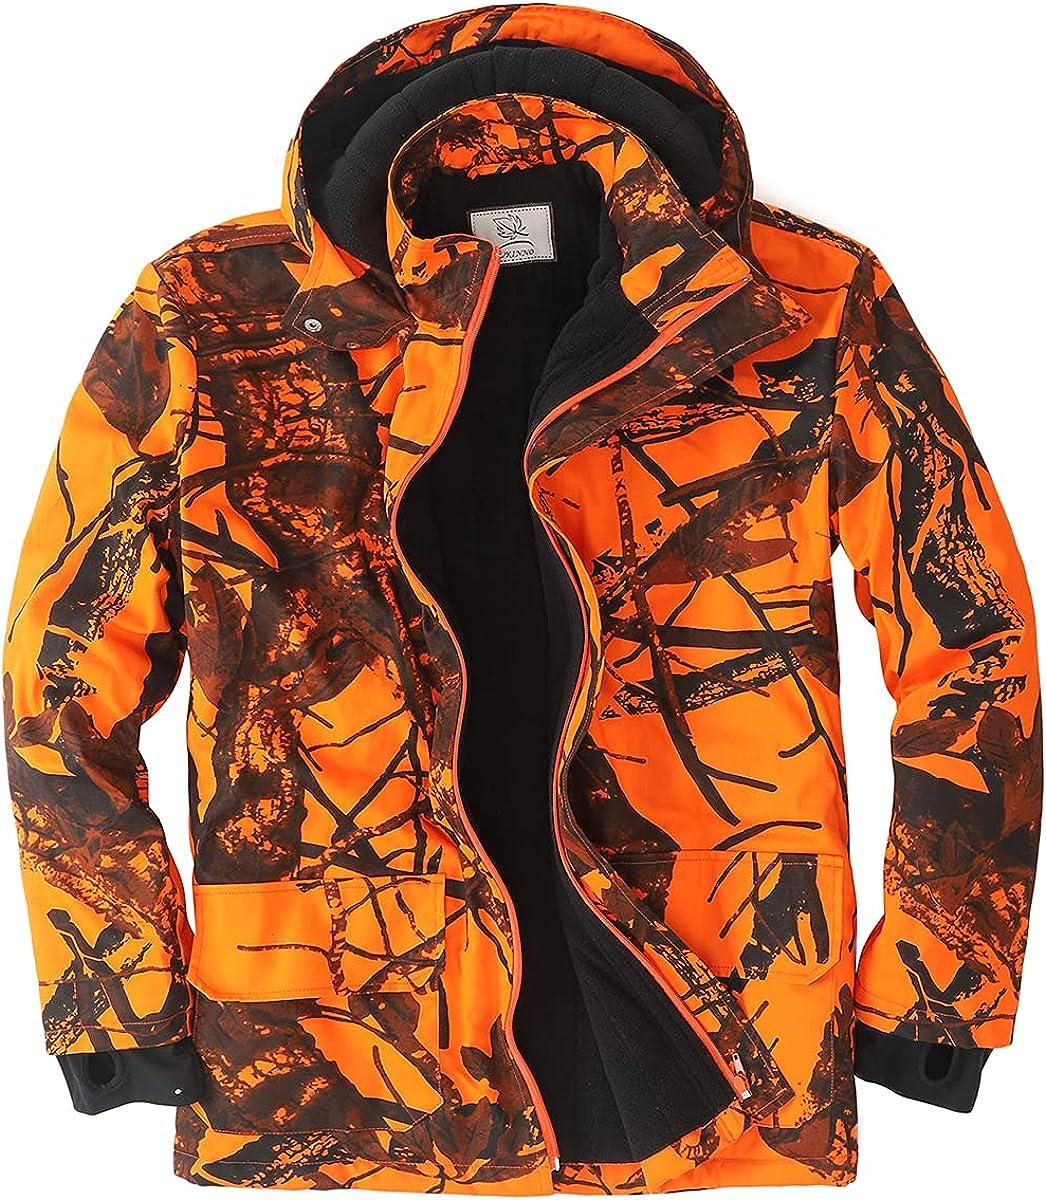 SUKNNO Outdoor Blaze Indianapolis Mall Orange Hunting Men for Fees free!! Camo Jacket